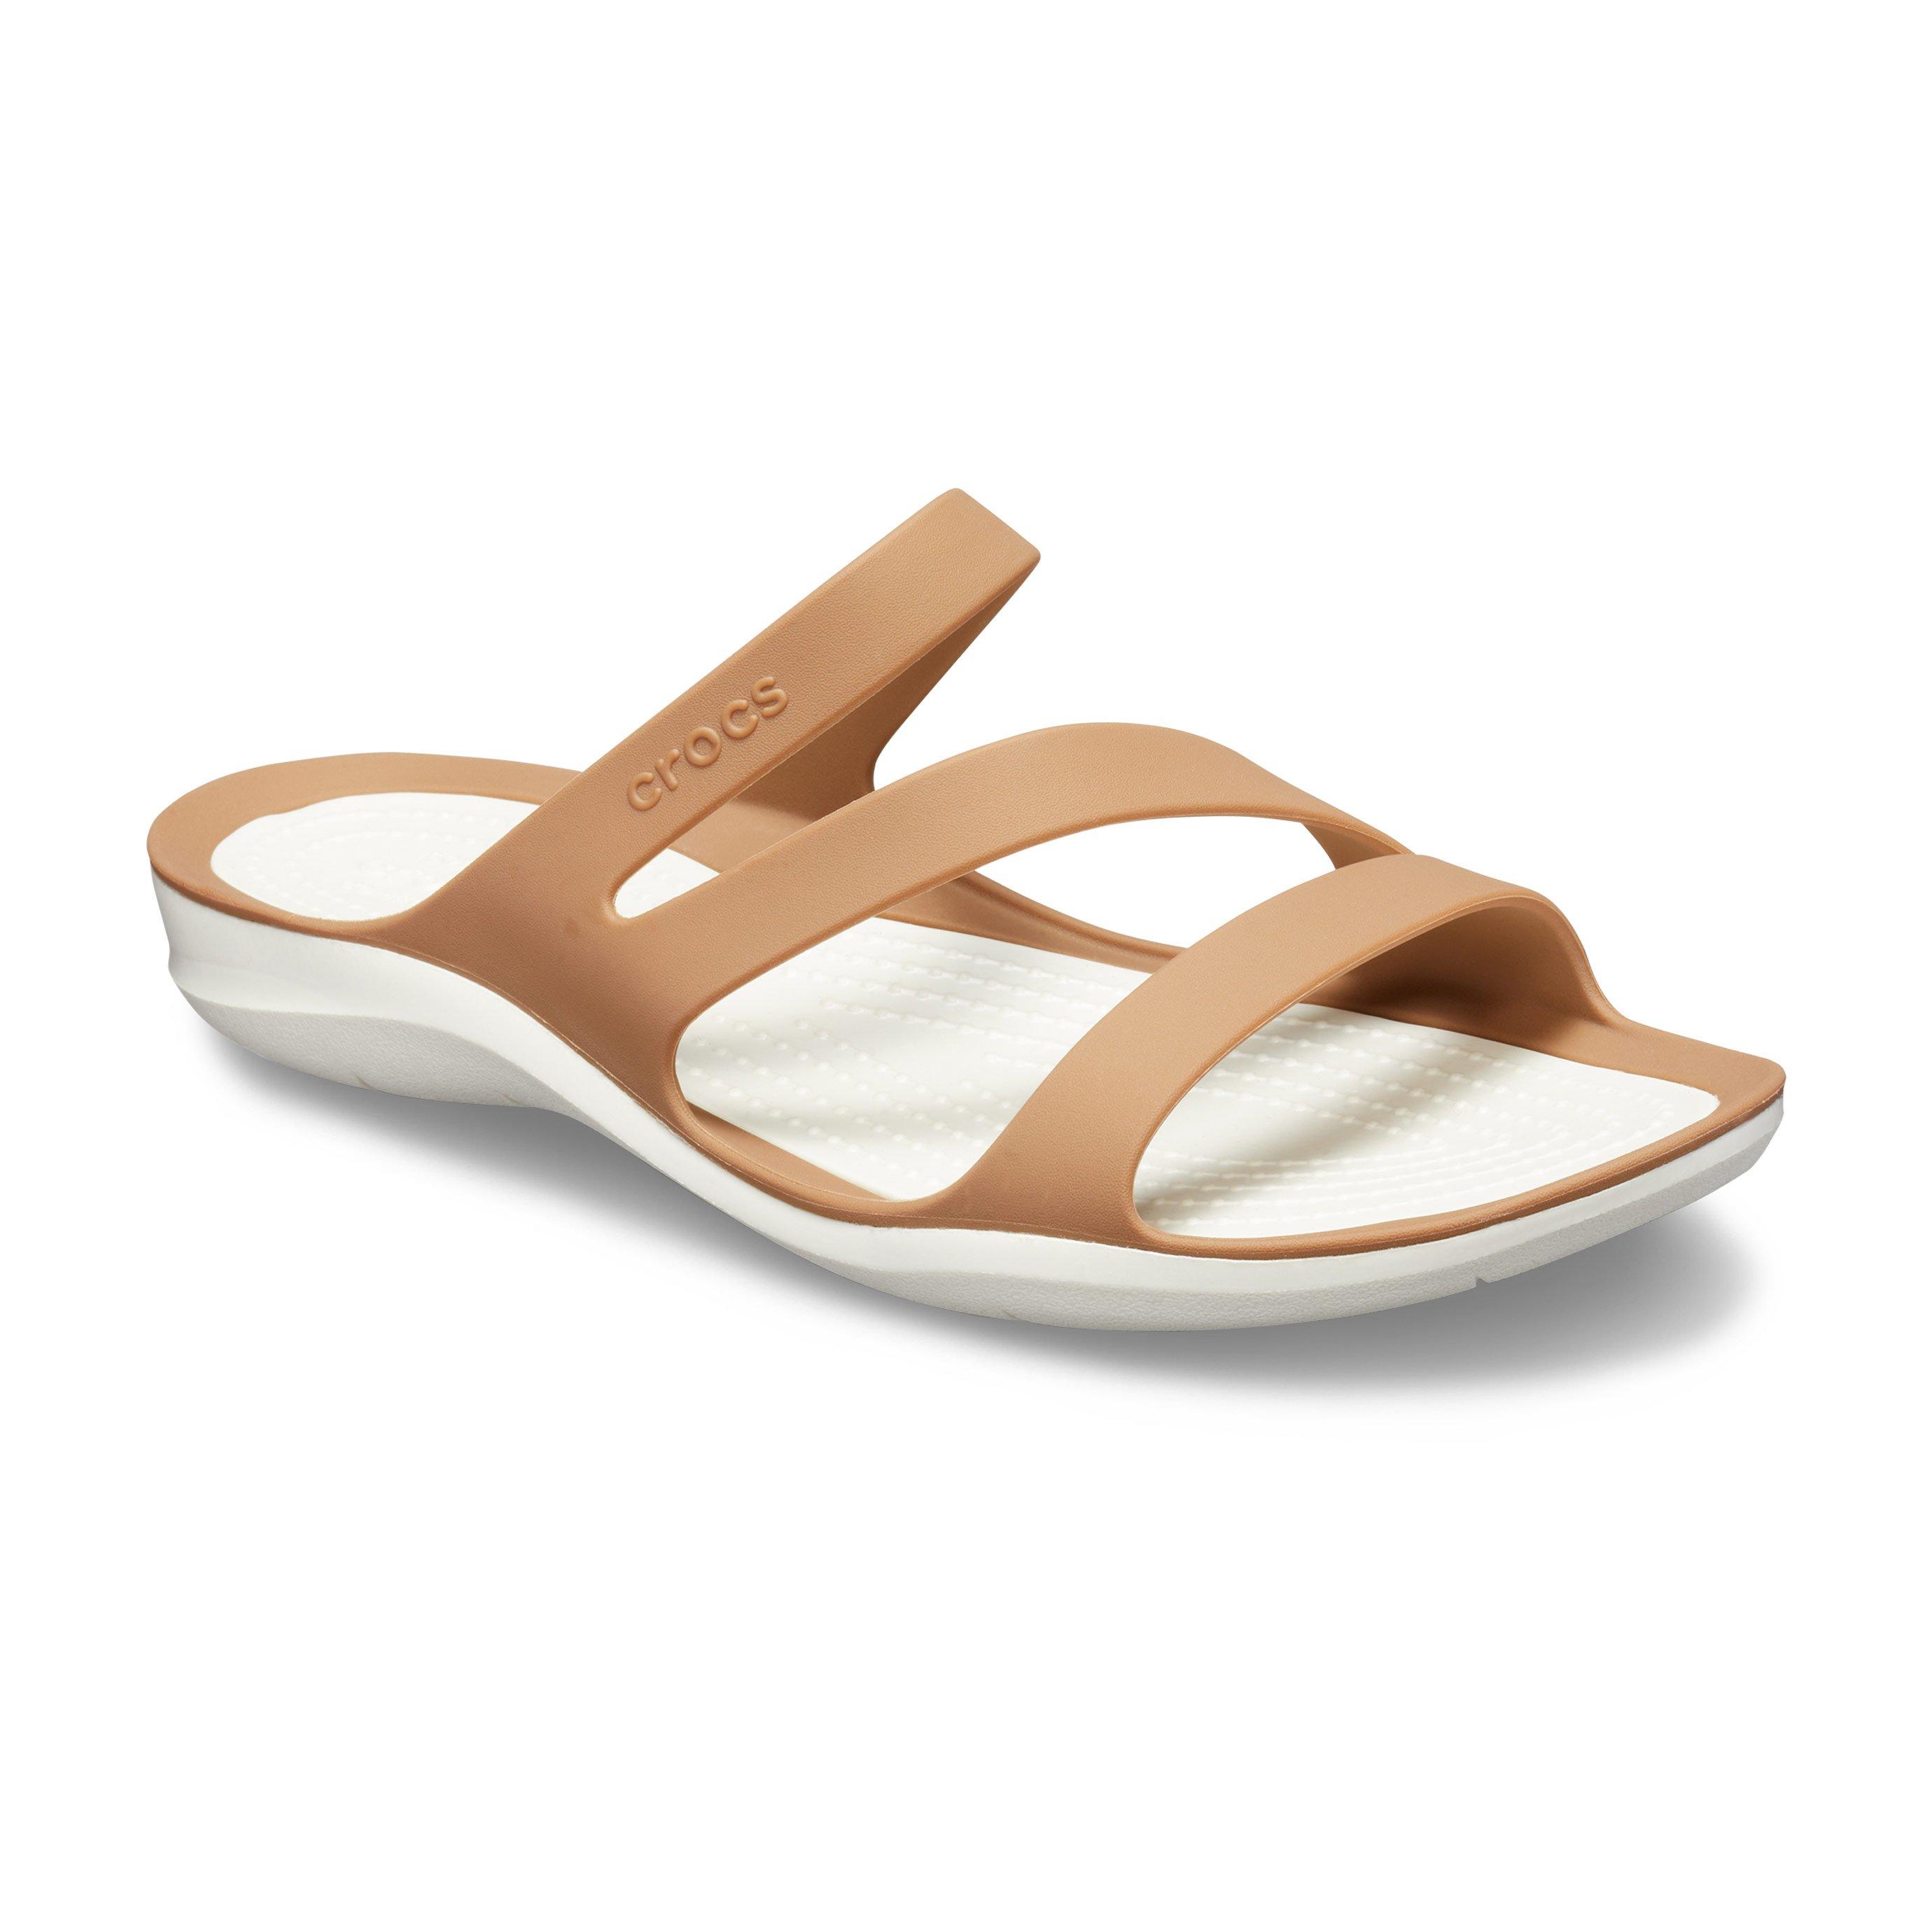 Crocs Swiftwater Sandal - כפכף רצועות לנשים בצבע ברונזה